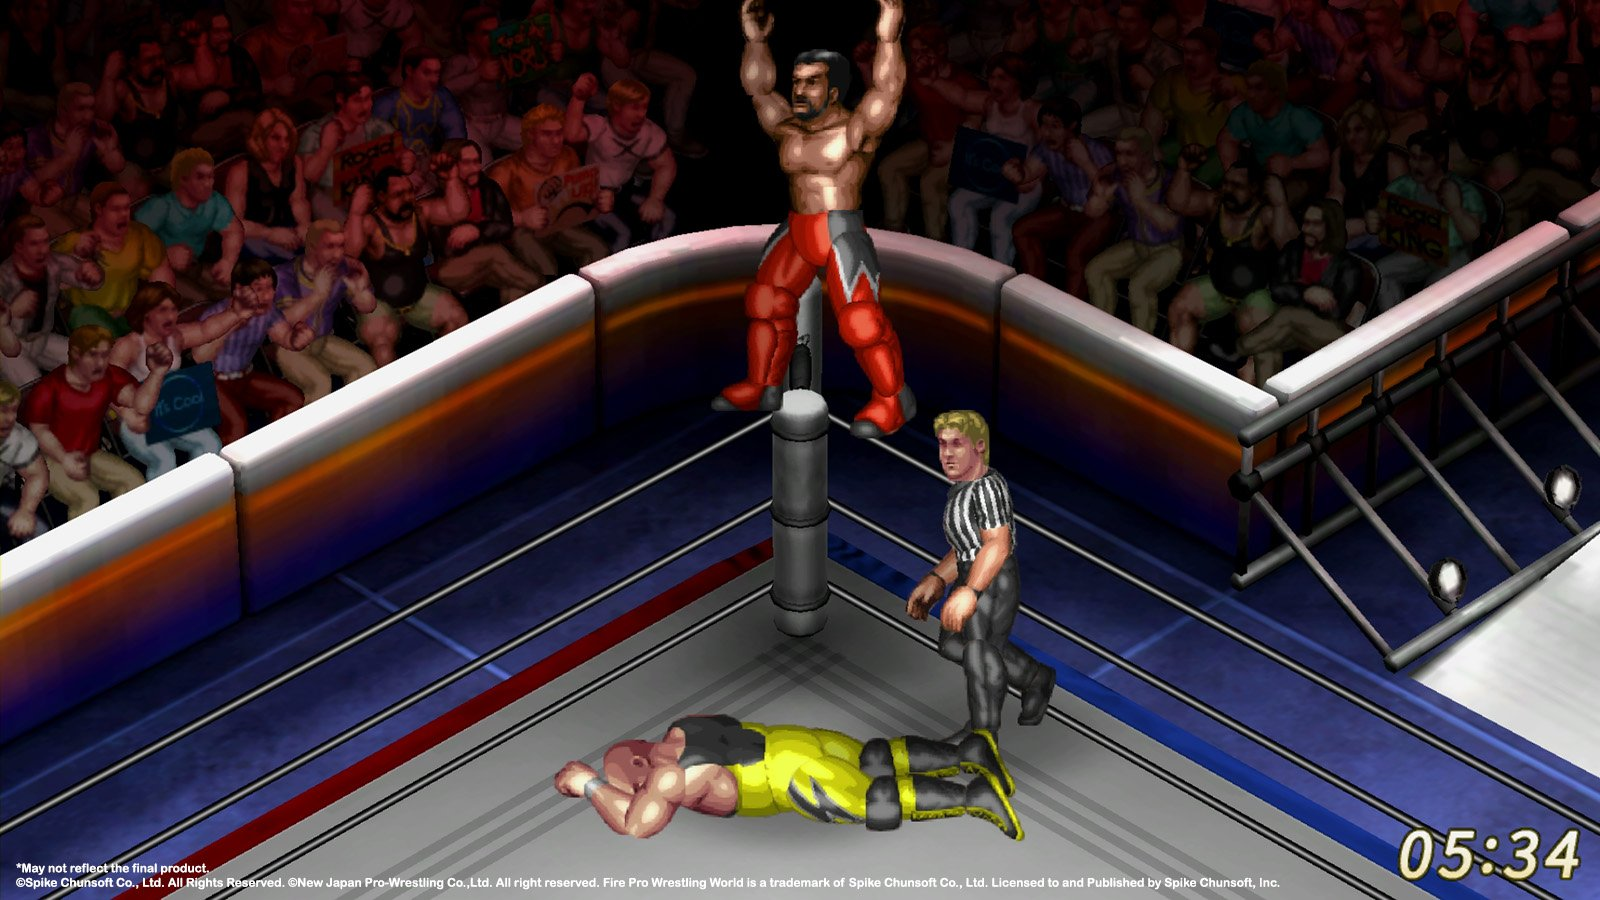 Fire-Pro-Wrestling-World_2018_03-23-18_001